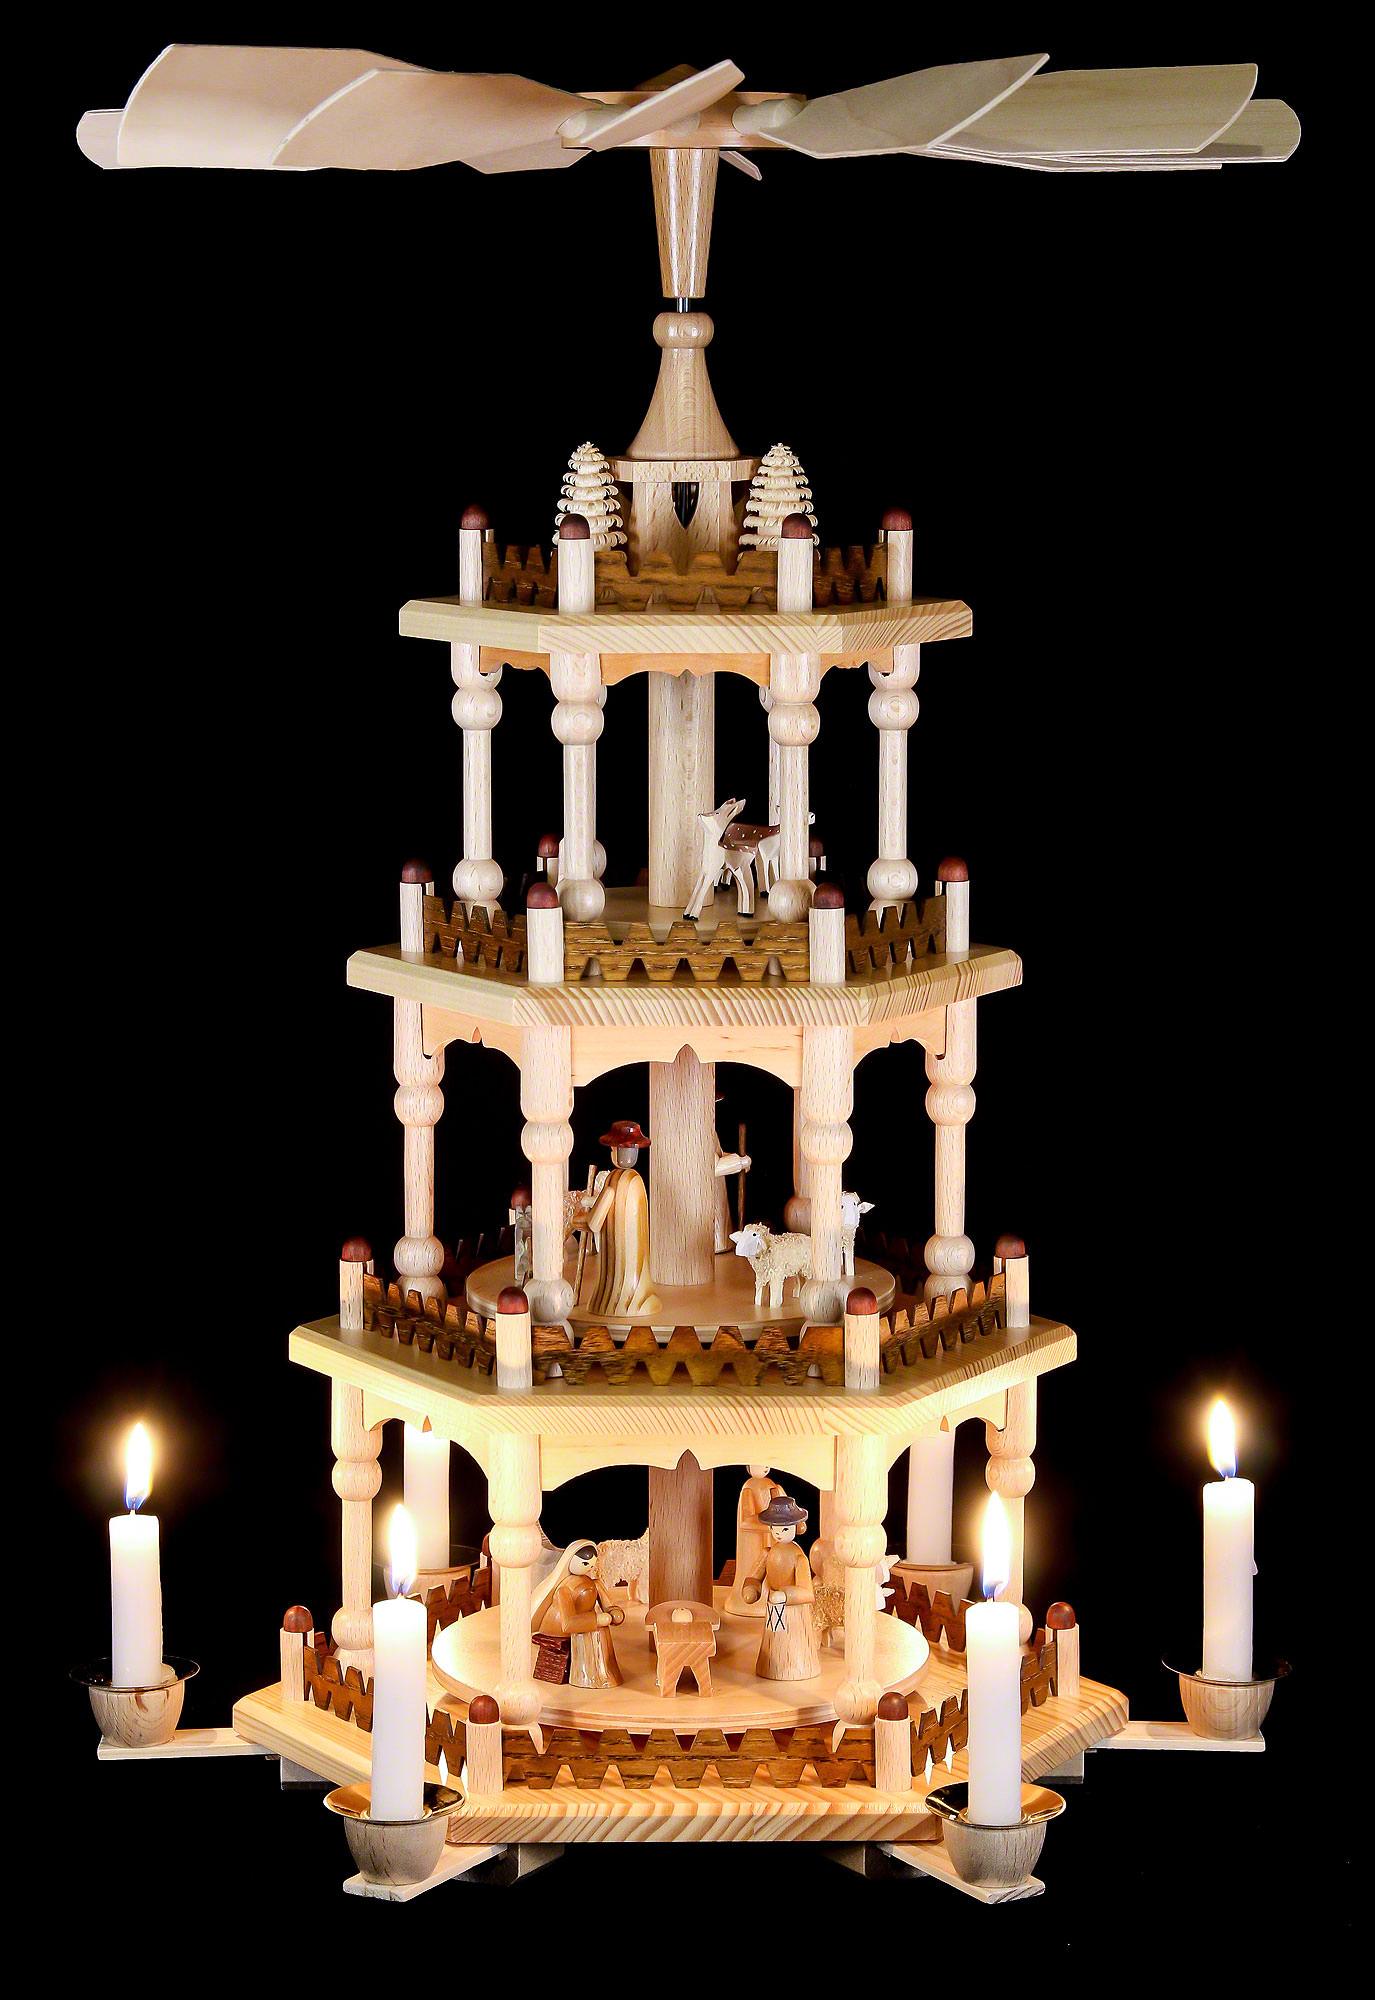 4 tier pyramid merry christmas 51 cm20in by theo lorenz kunsthandwerk